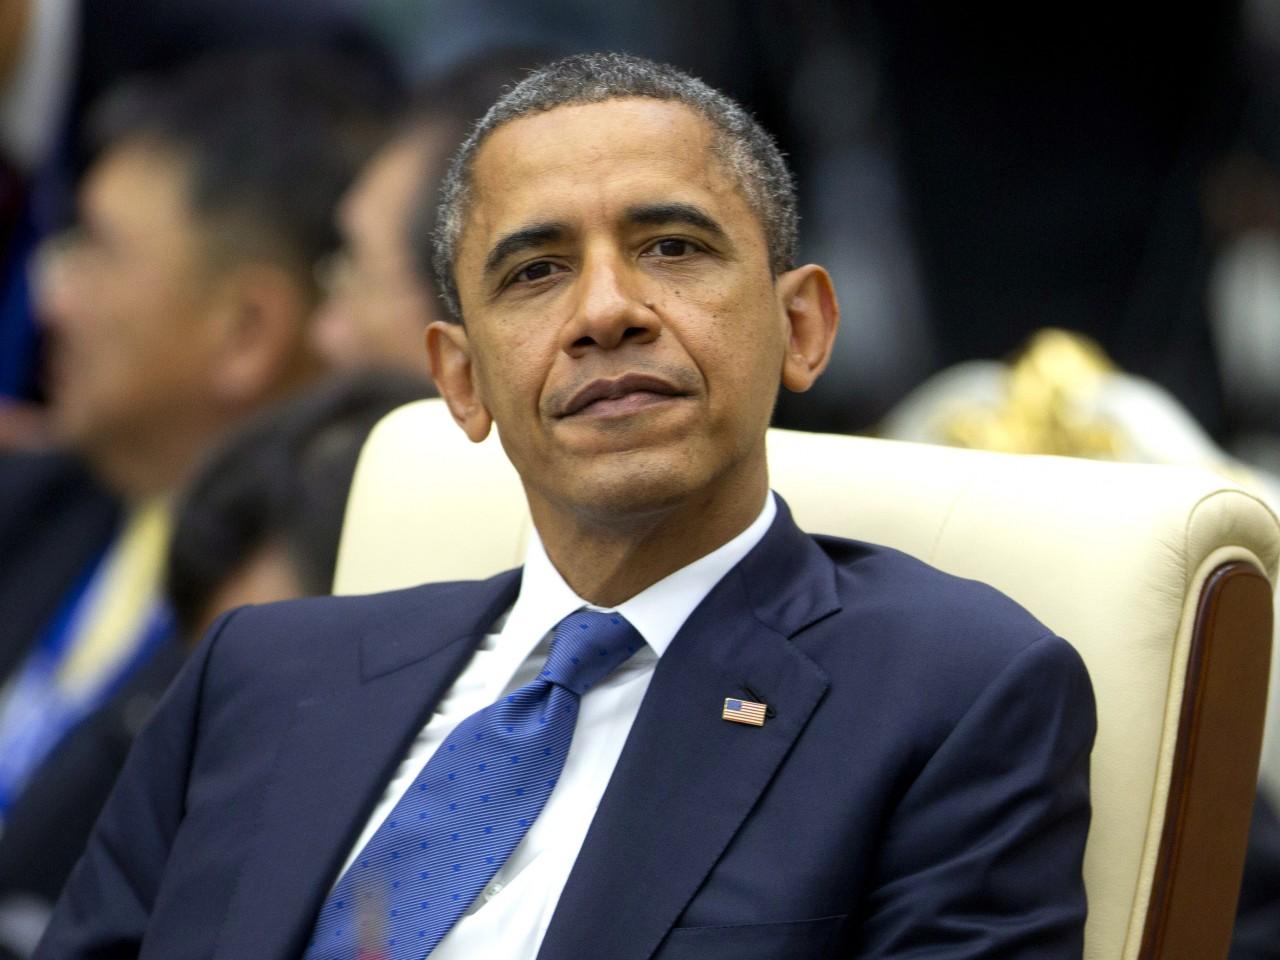 Barack Obama; Barack Obama ...